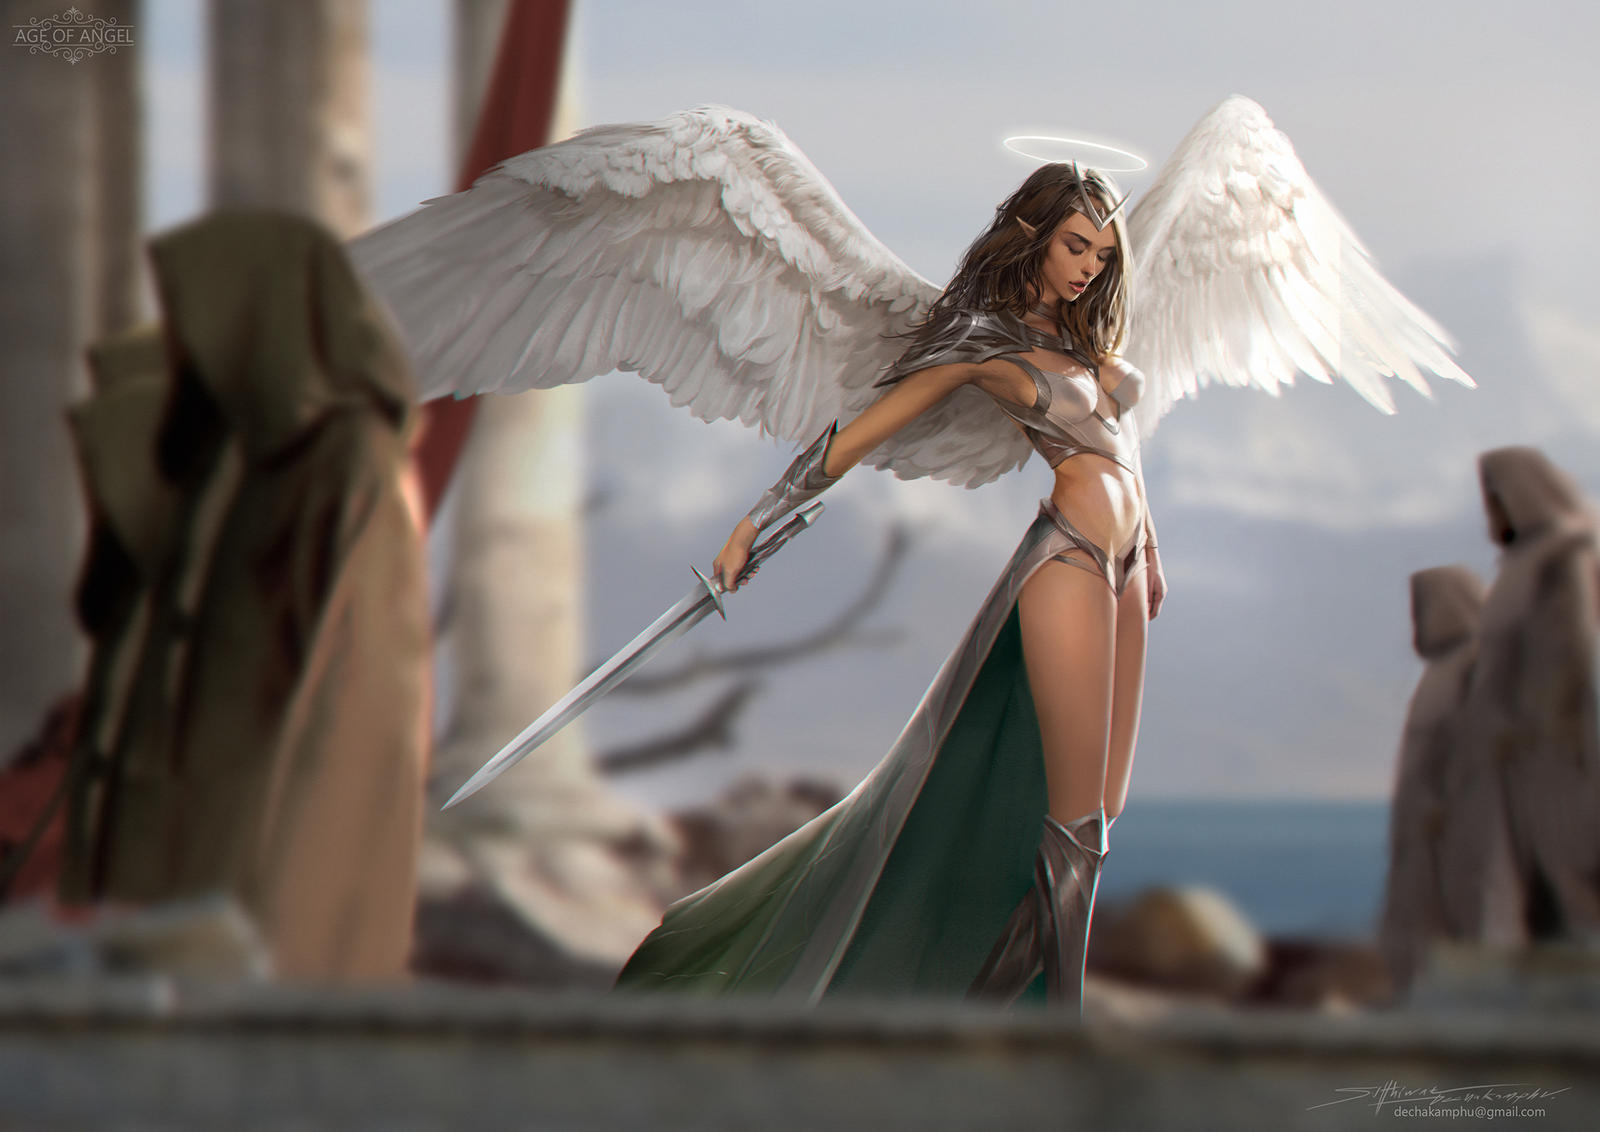 Age of Angel by TheRafa